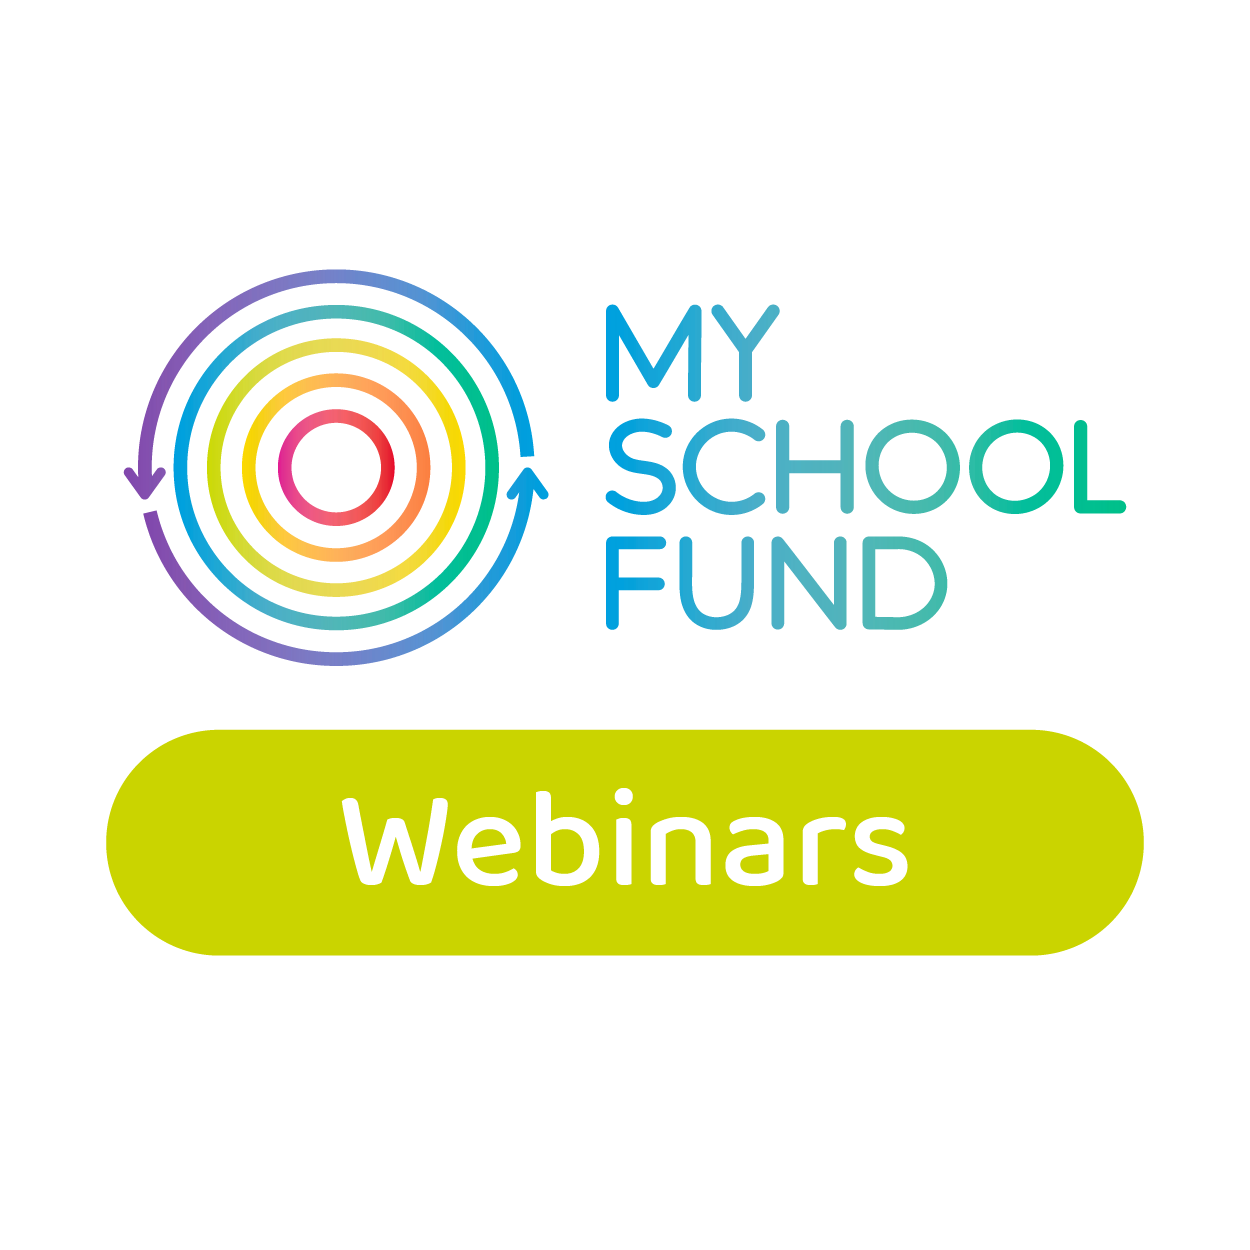 Join Us: Our My School Fund Webinars